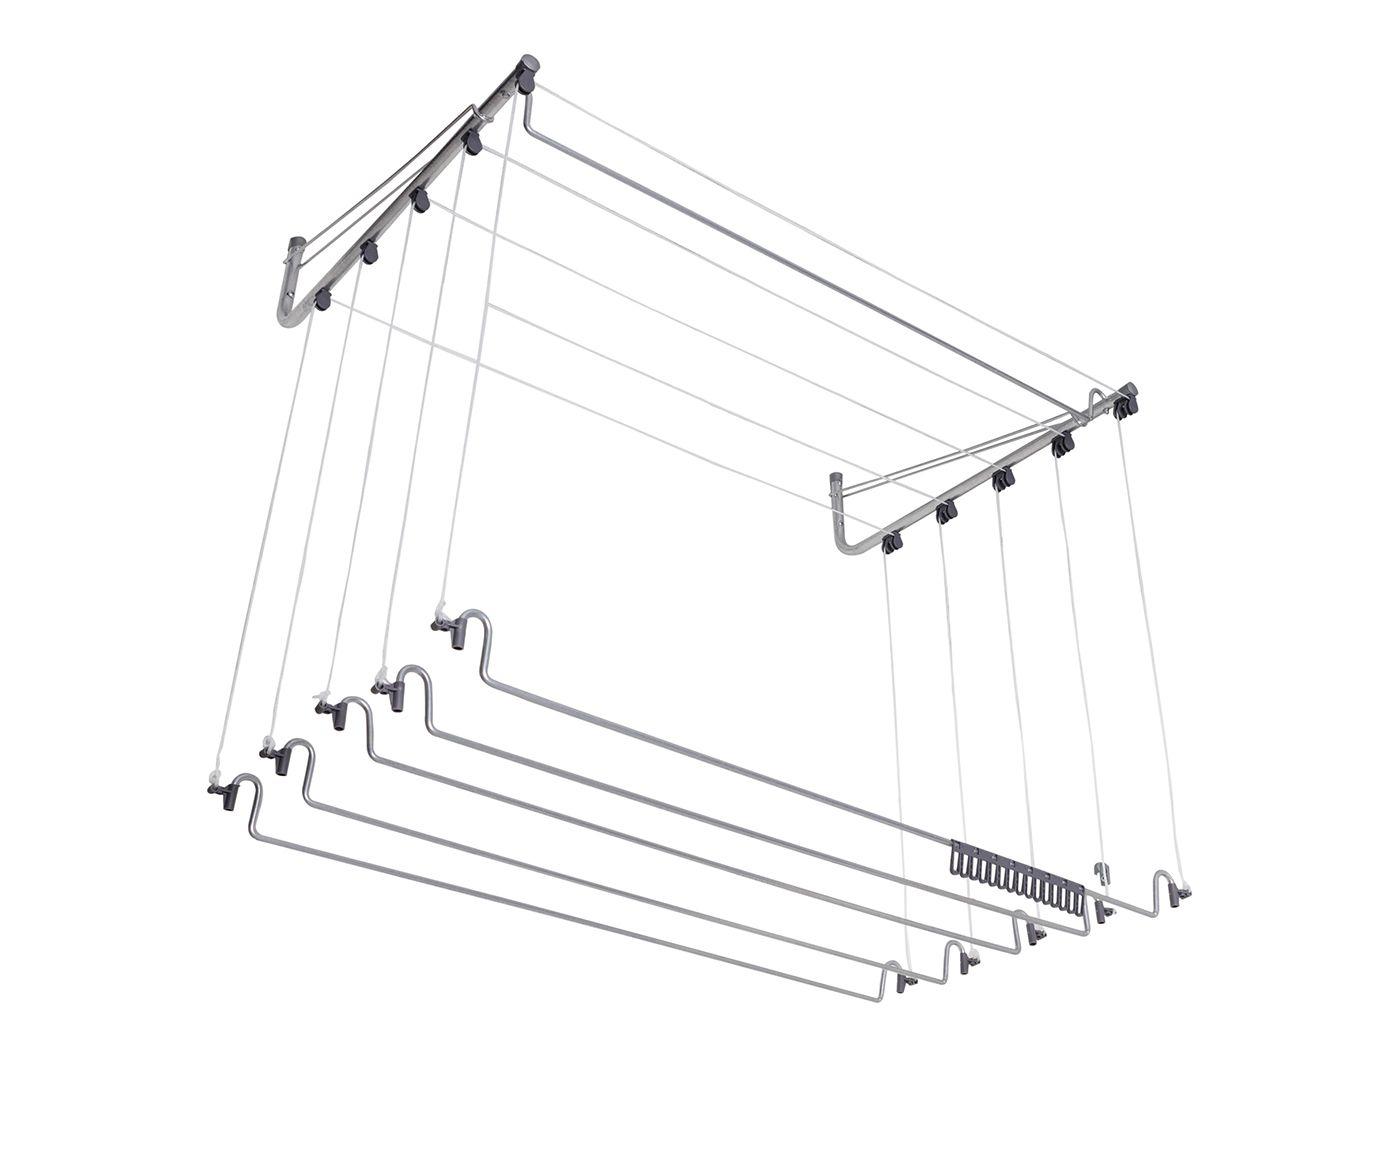 Varal Indepentende Kery Concreto - 93X17X58cm | Westwing.com.br